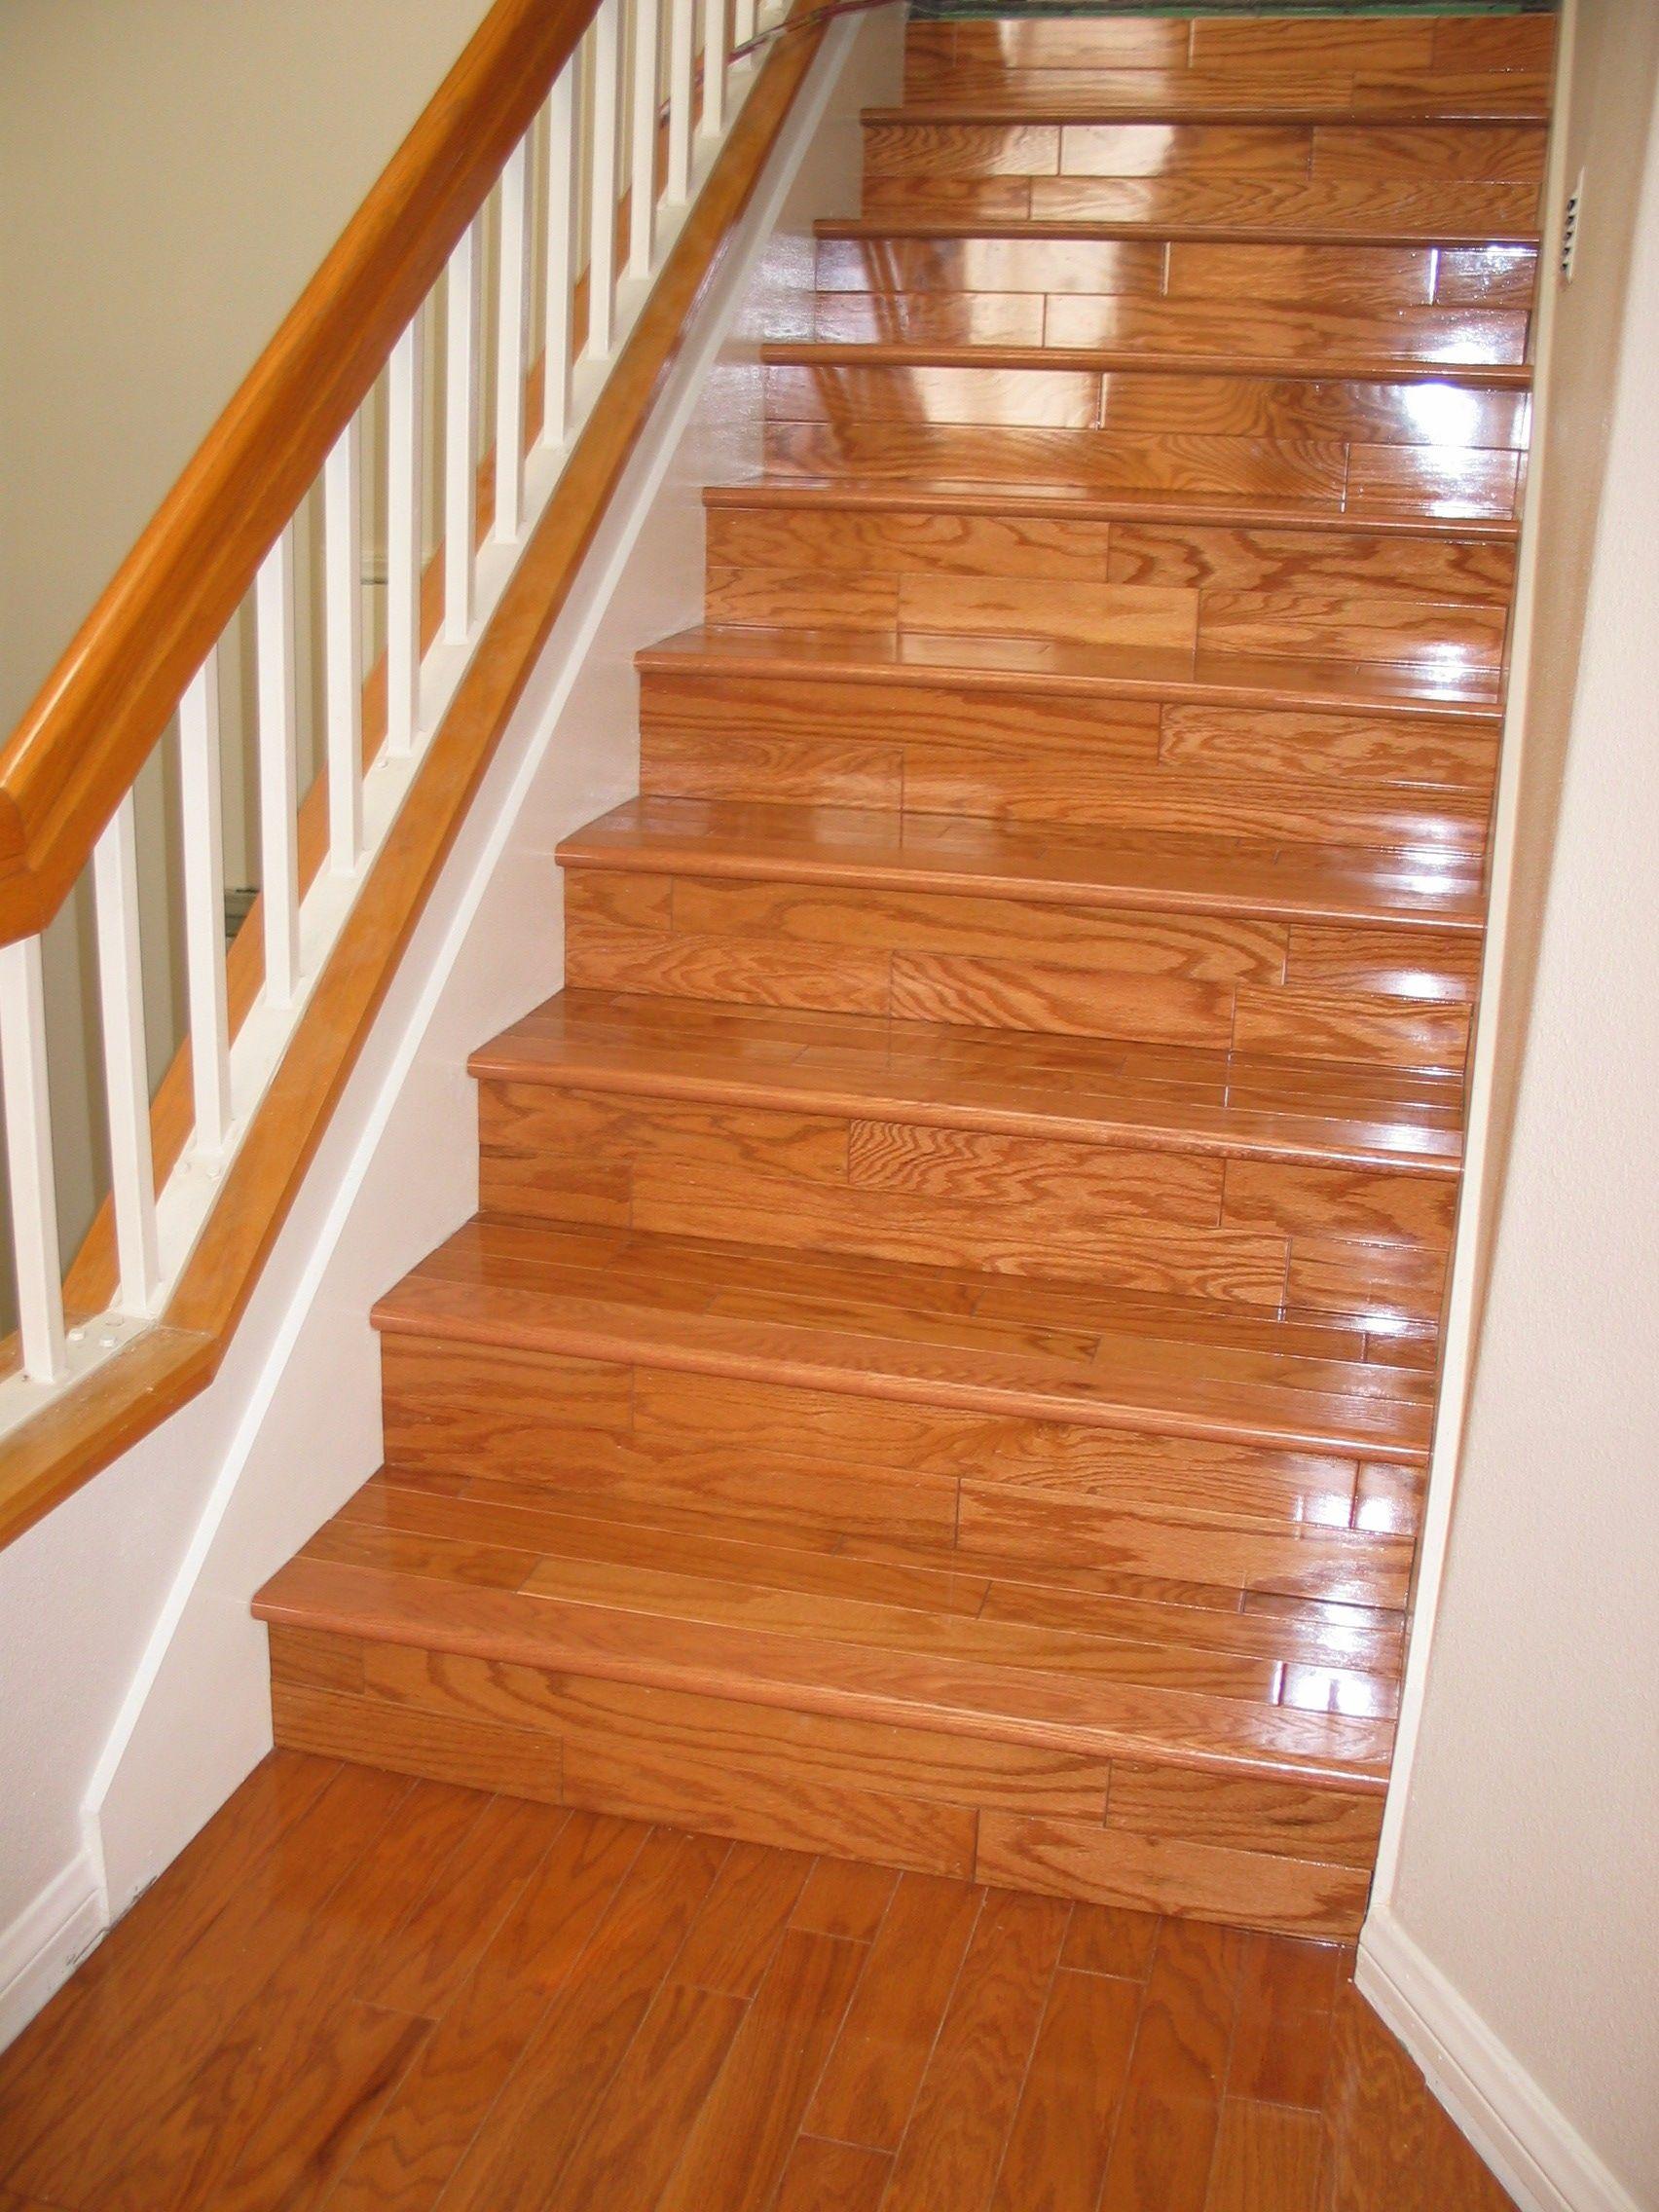 Rich Johnson Flooring Installations And Repairs Laminate   Installing Hardwood On Stairs   Tile Riser White Landing Tread   Combined Wood   Brazilian Cherry Hardwood Stair   Cream Wood   Bottom Stair